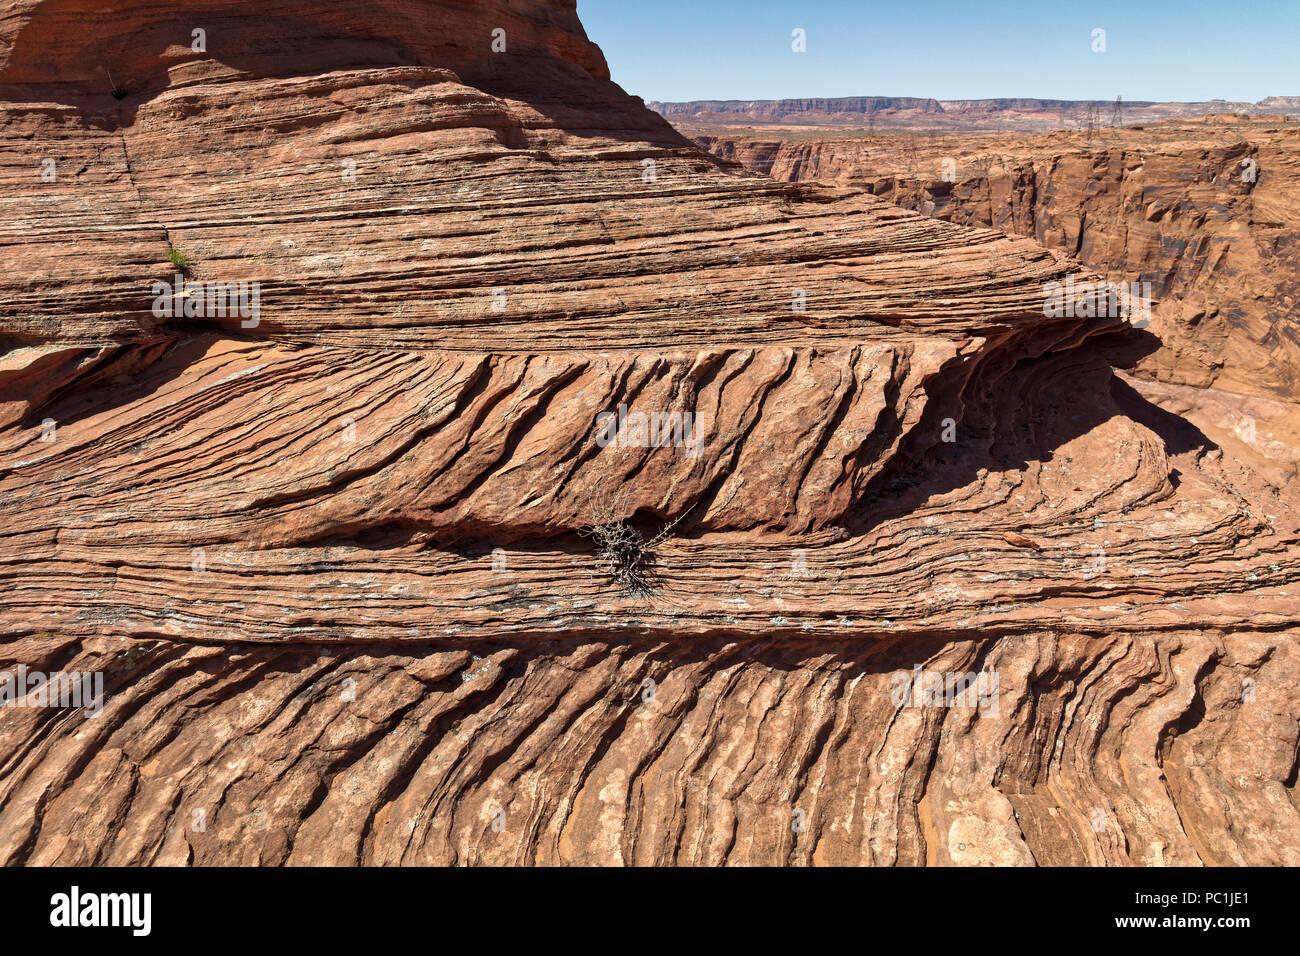 Ropa de cama cruz de piedra arenisca de Navajo en Horseshoe Bend, Glen Canyon National Recreation Area, Page, Arizona Imagen De Stock